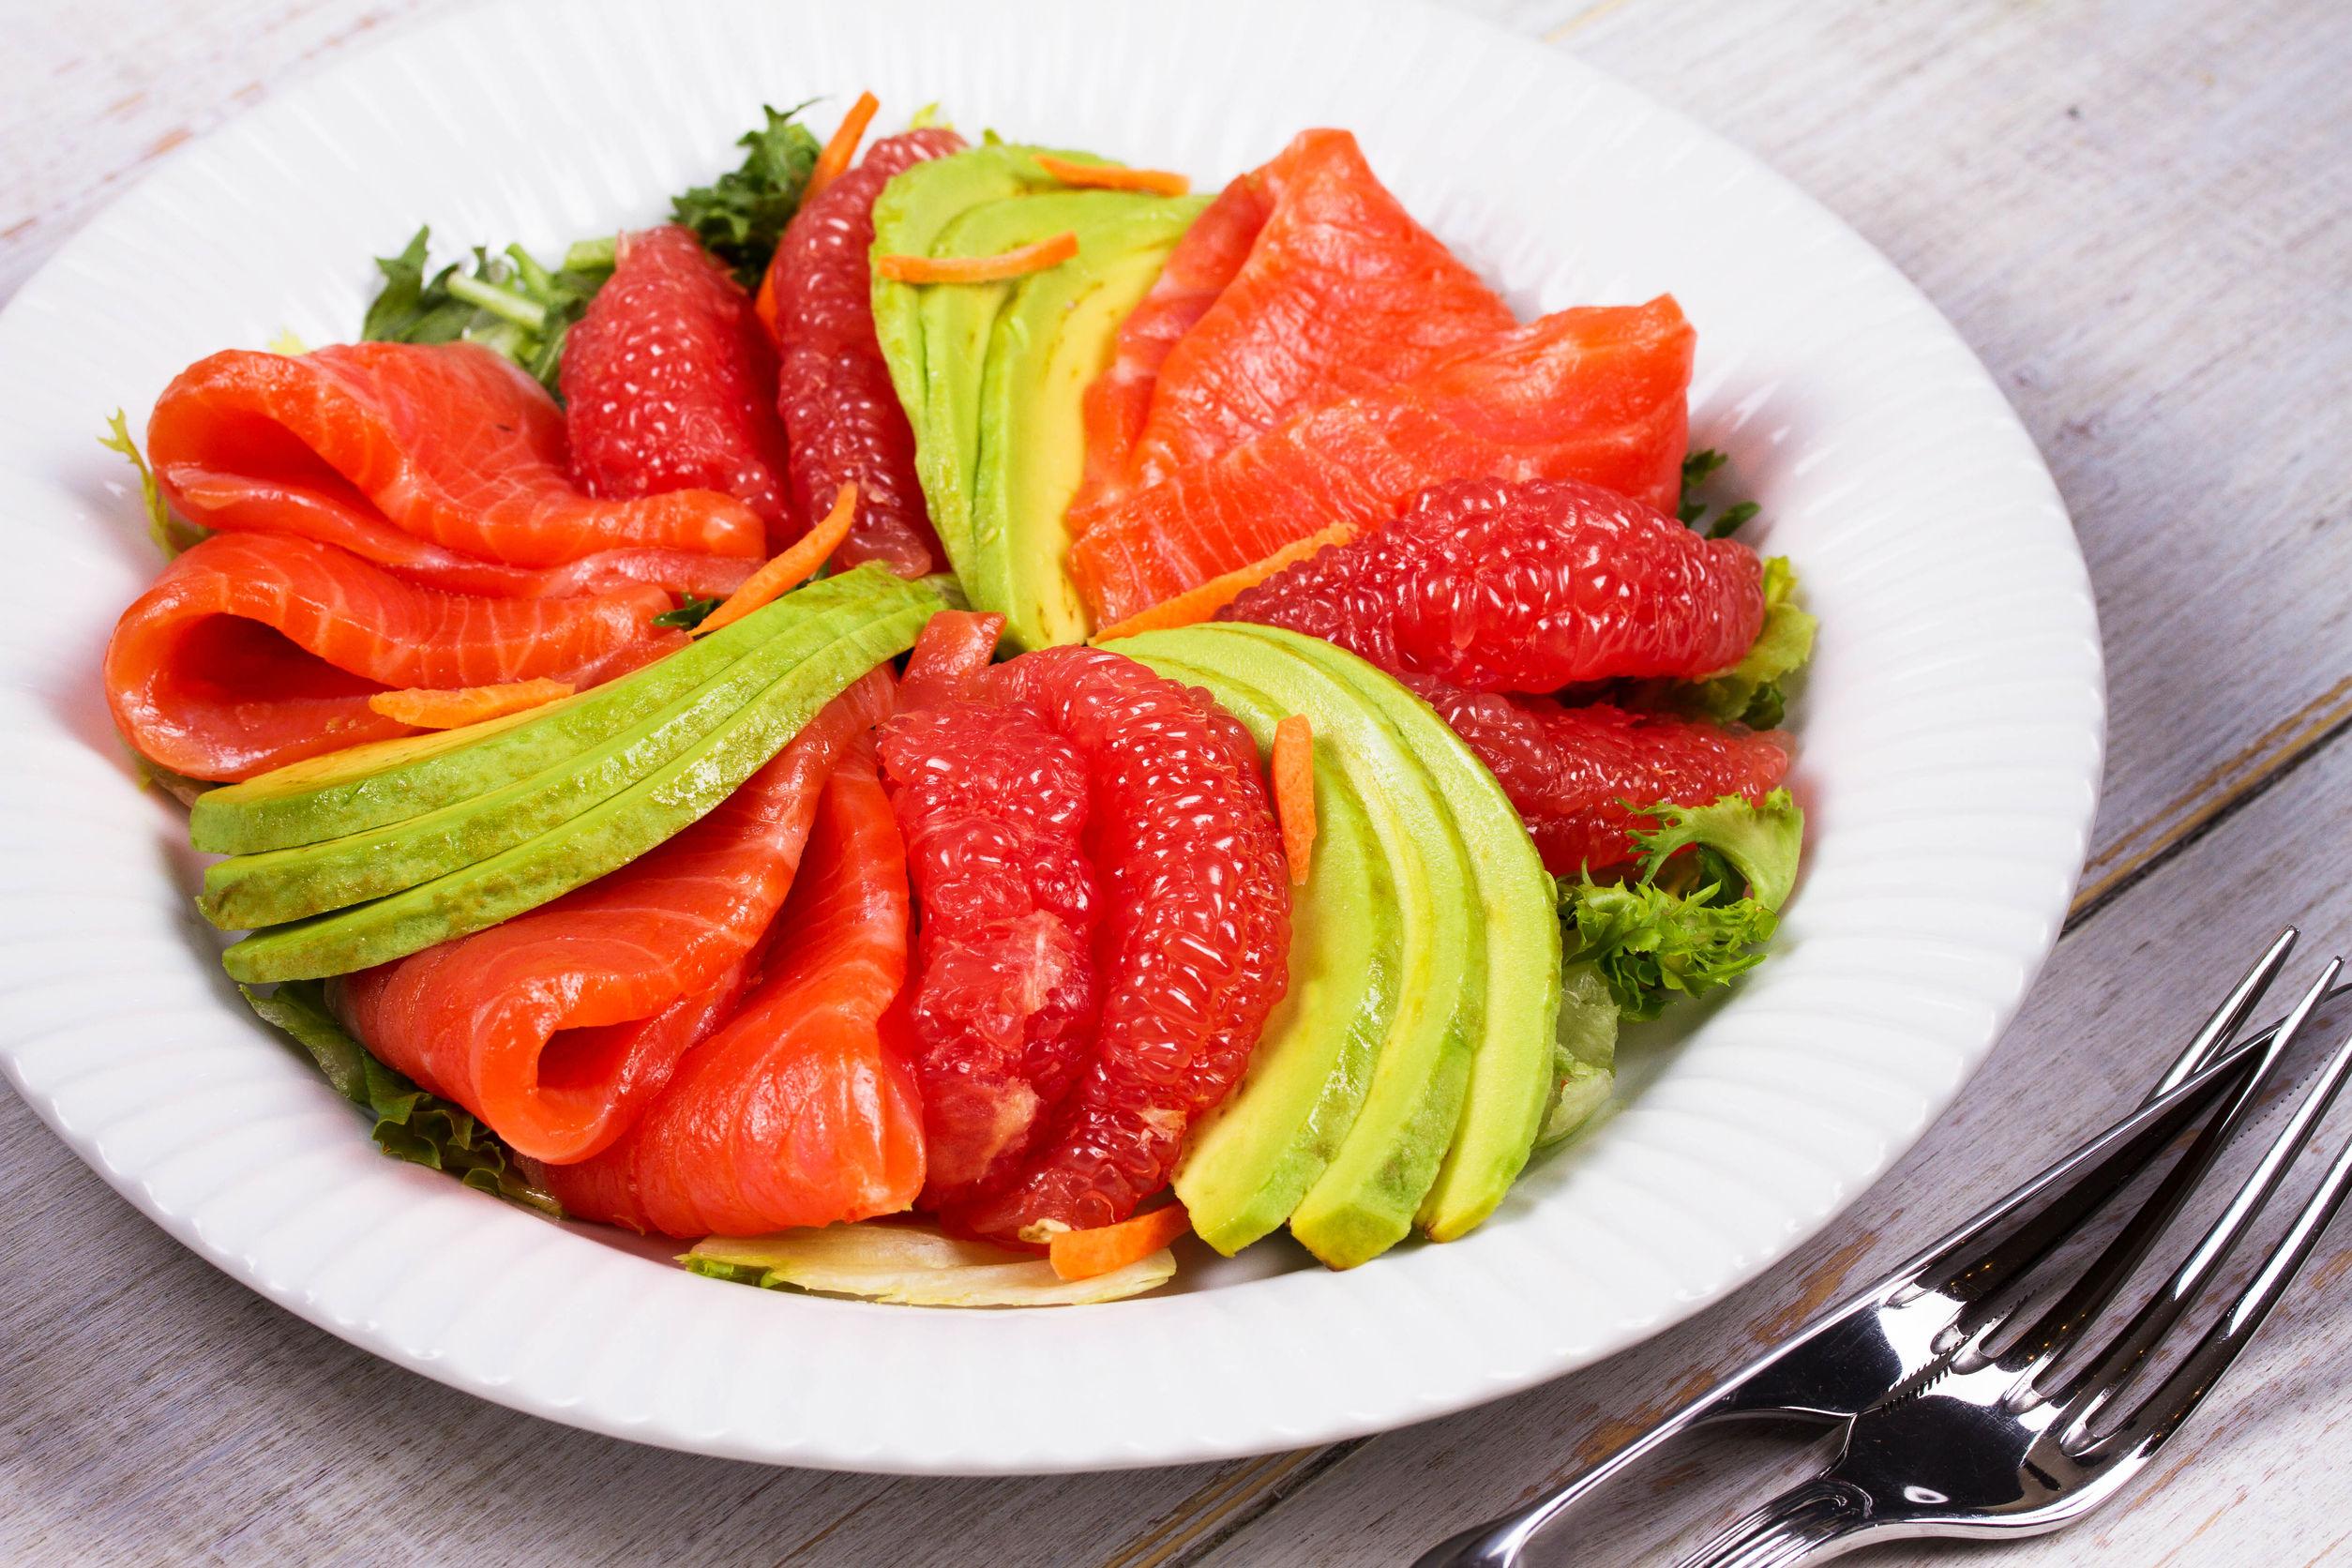 Salmon & Avocado Salad with Citrus Dressing